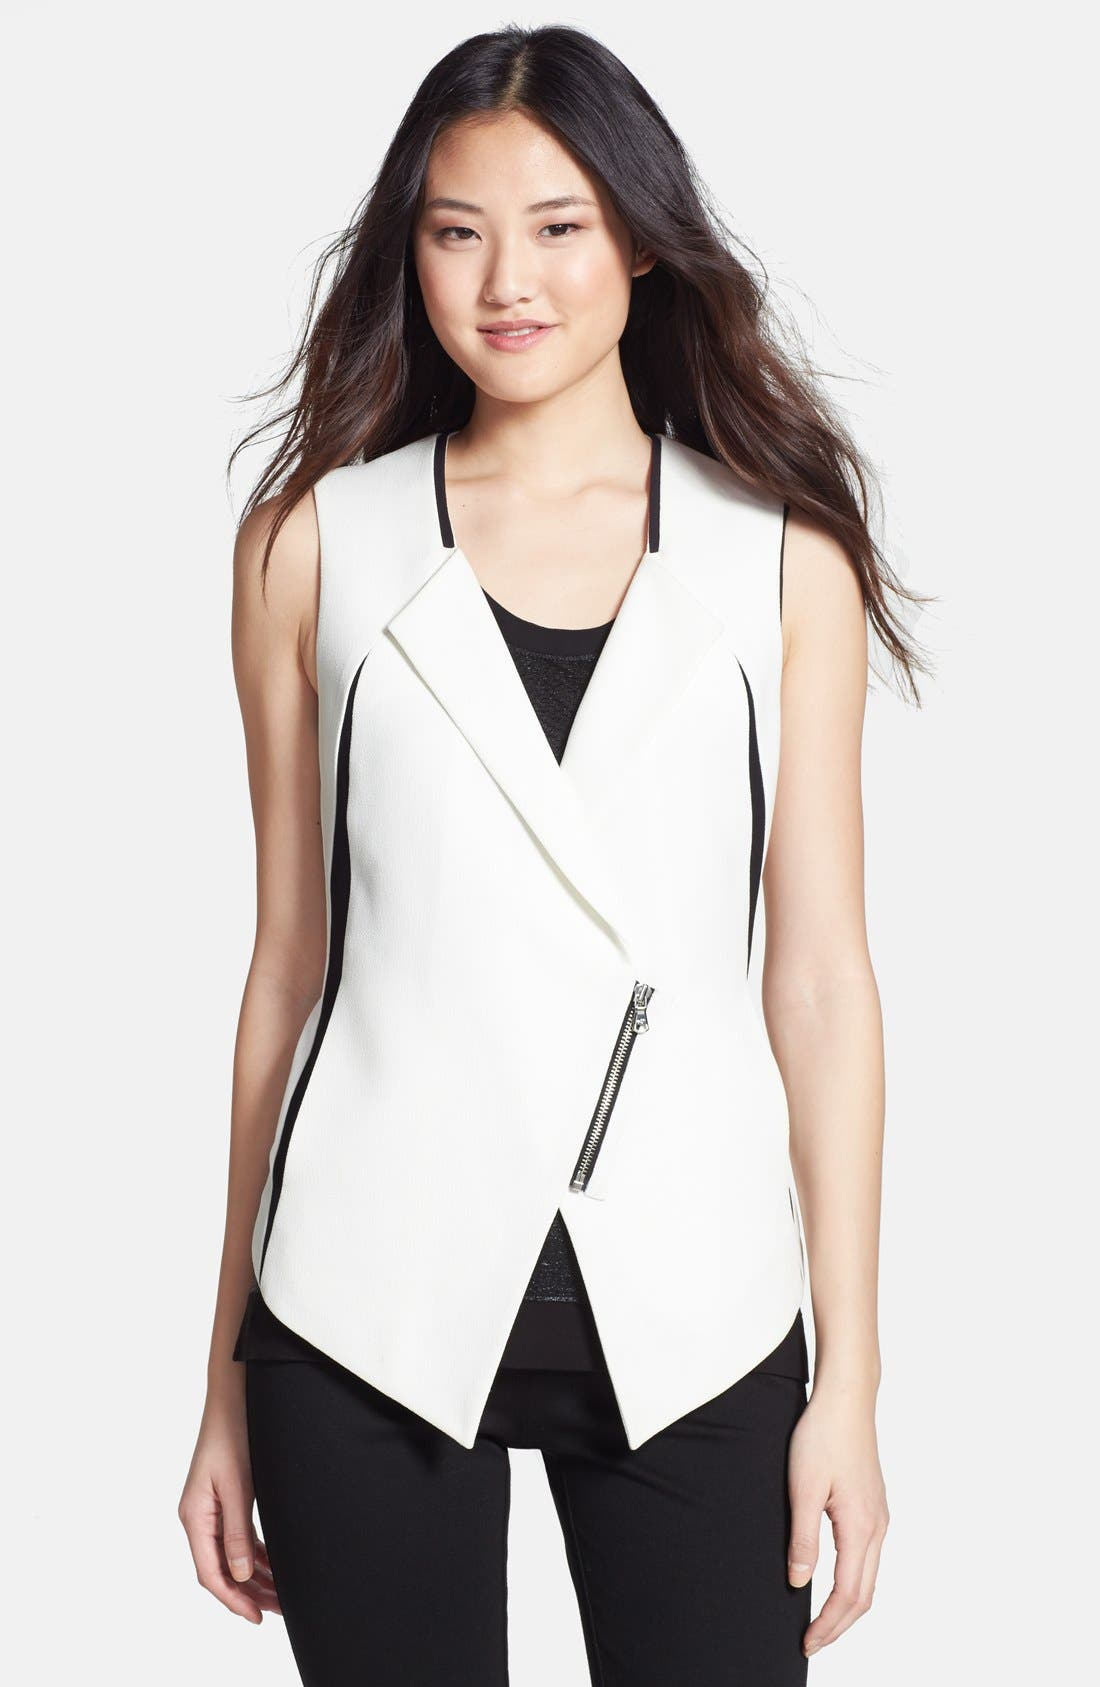 KENNETH COLE NEW YORK 'Daisy' Vest, Main, color, 900